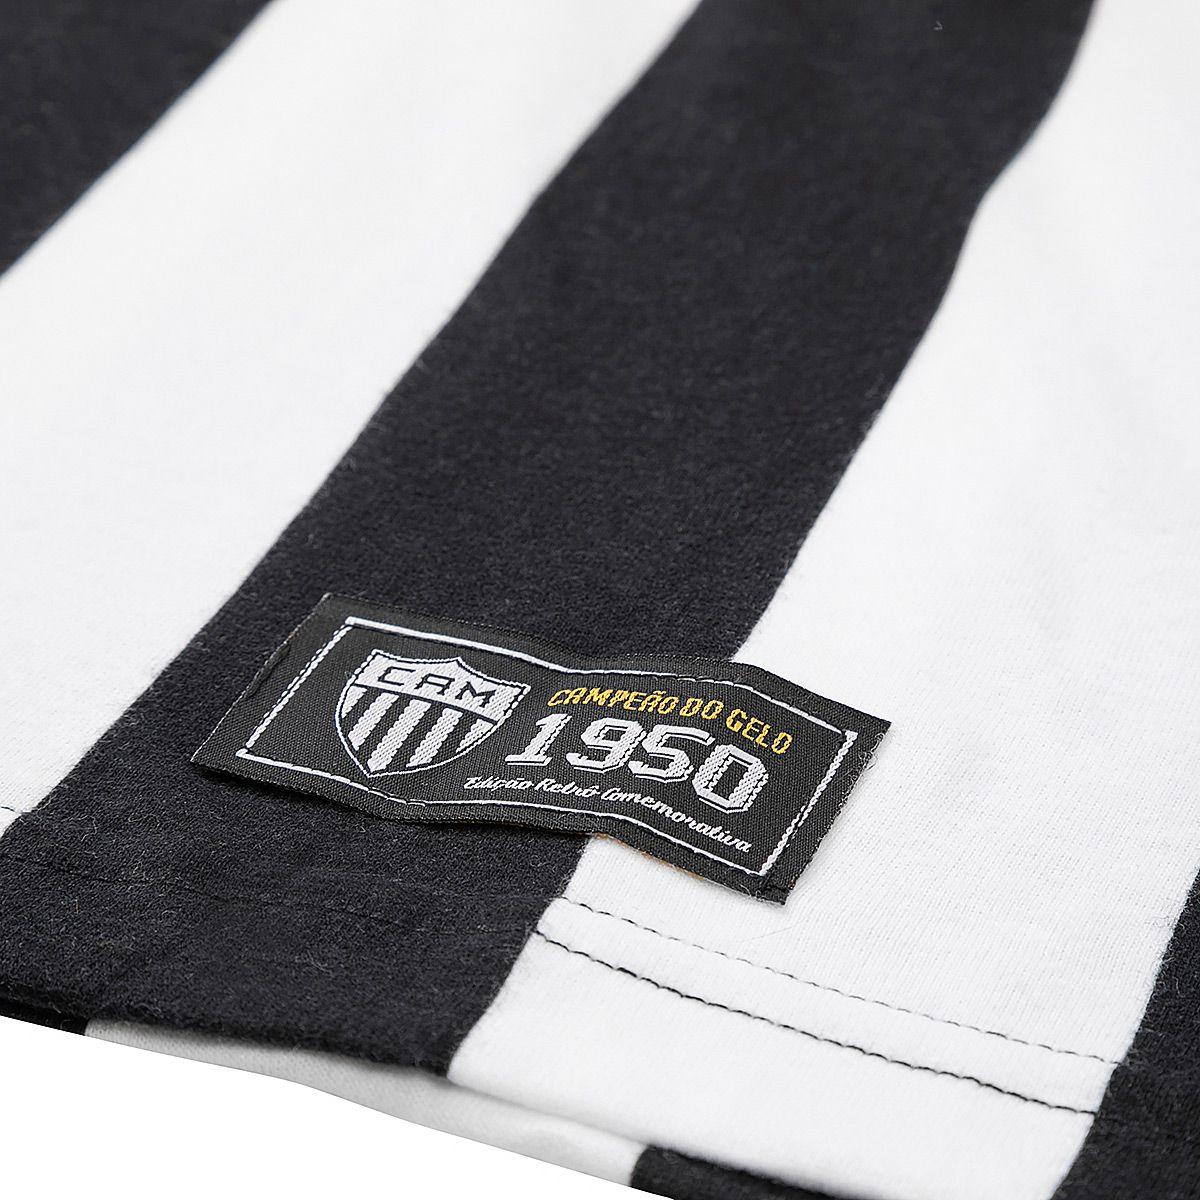 Camisa Atlético Mineiro Retrô 1950